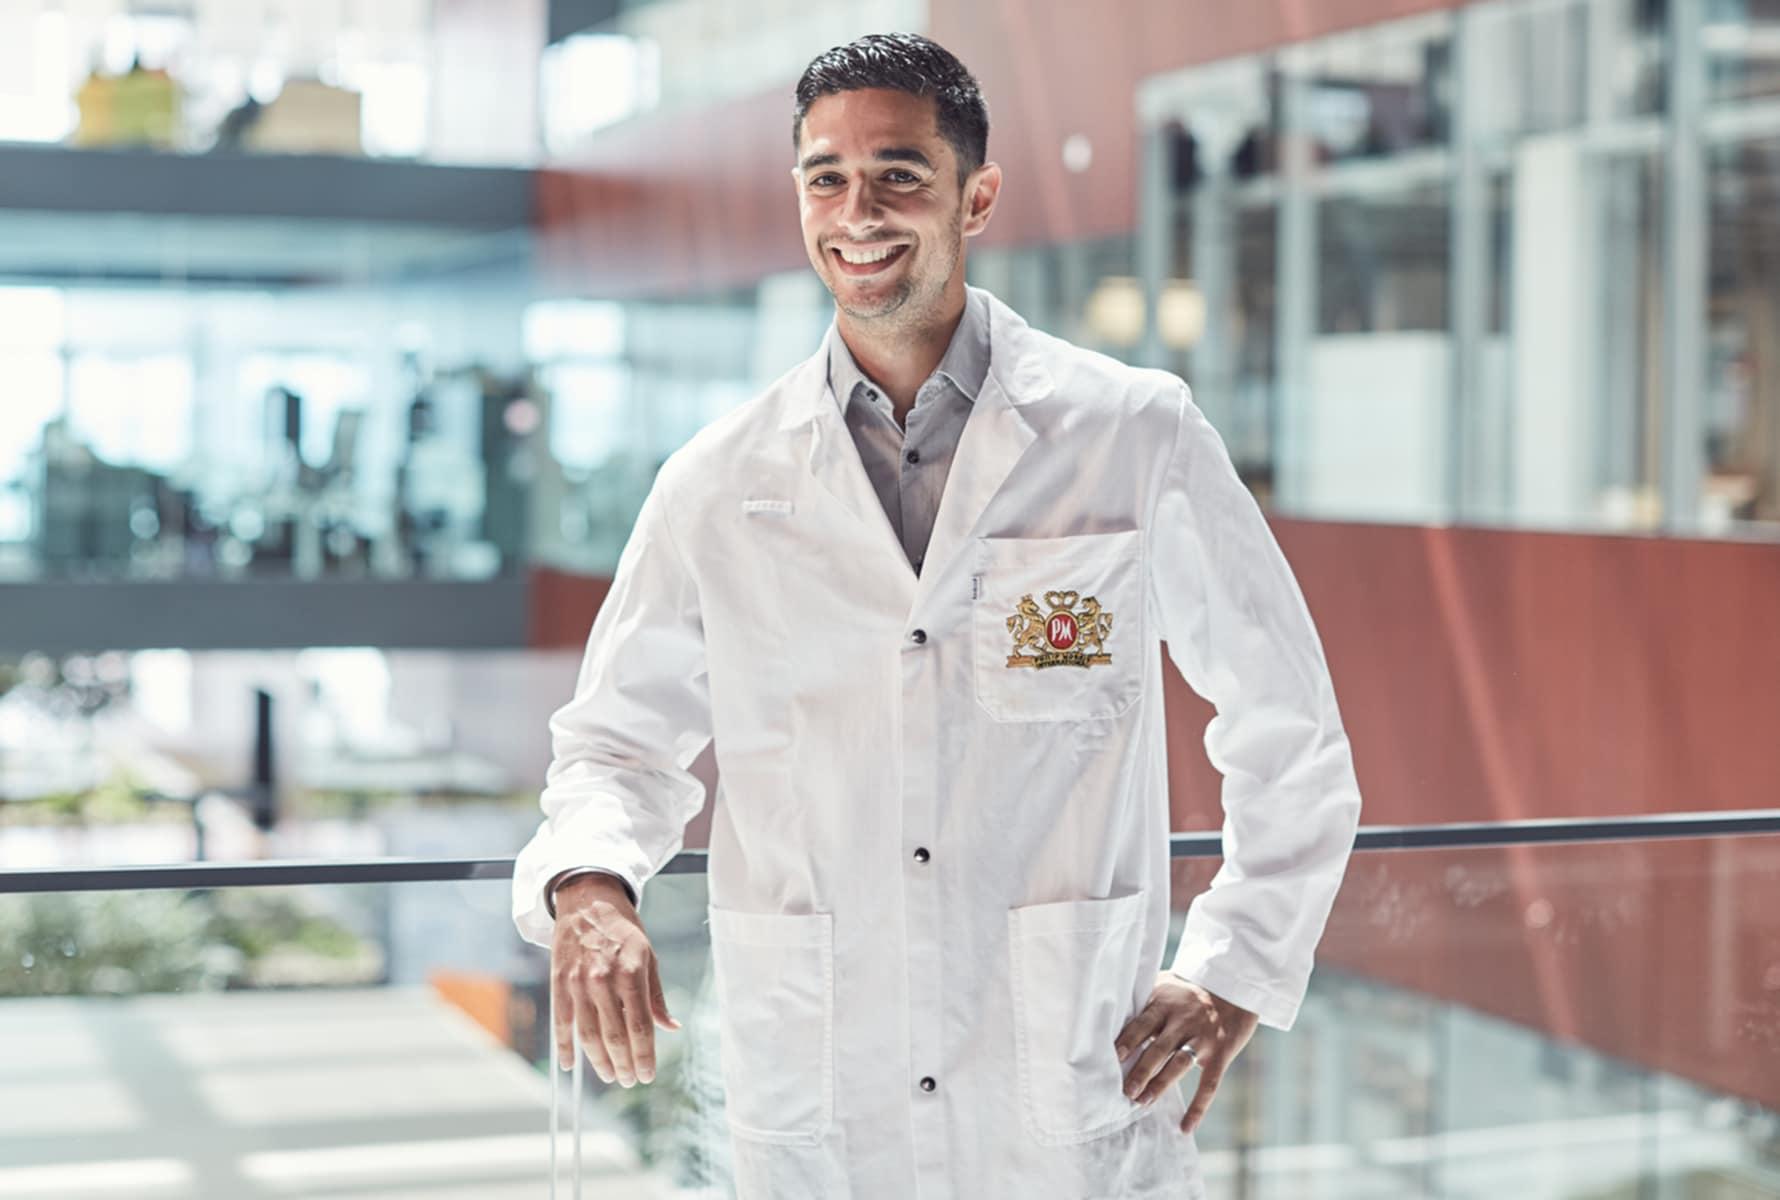 PMI scientist Cube highlight crop